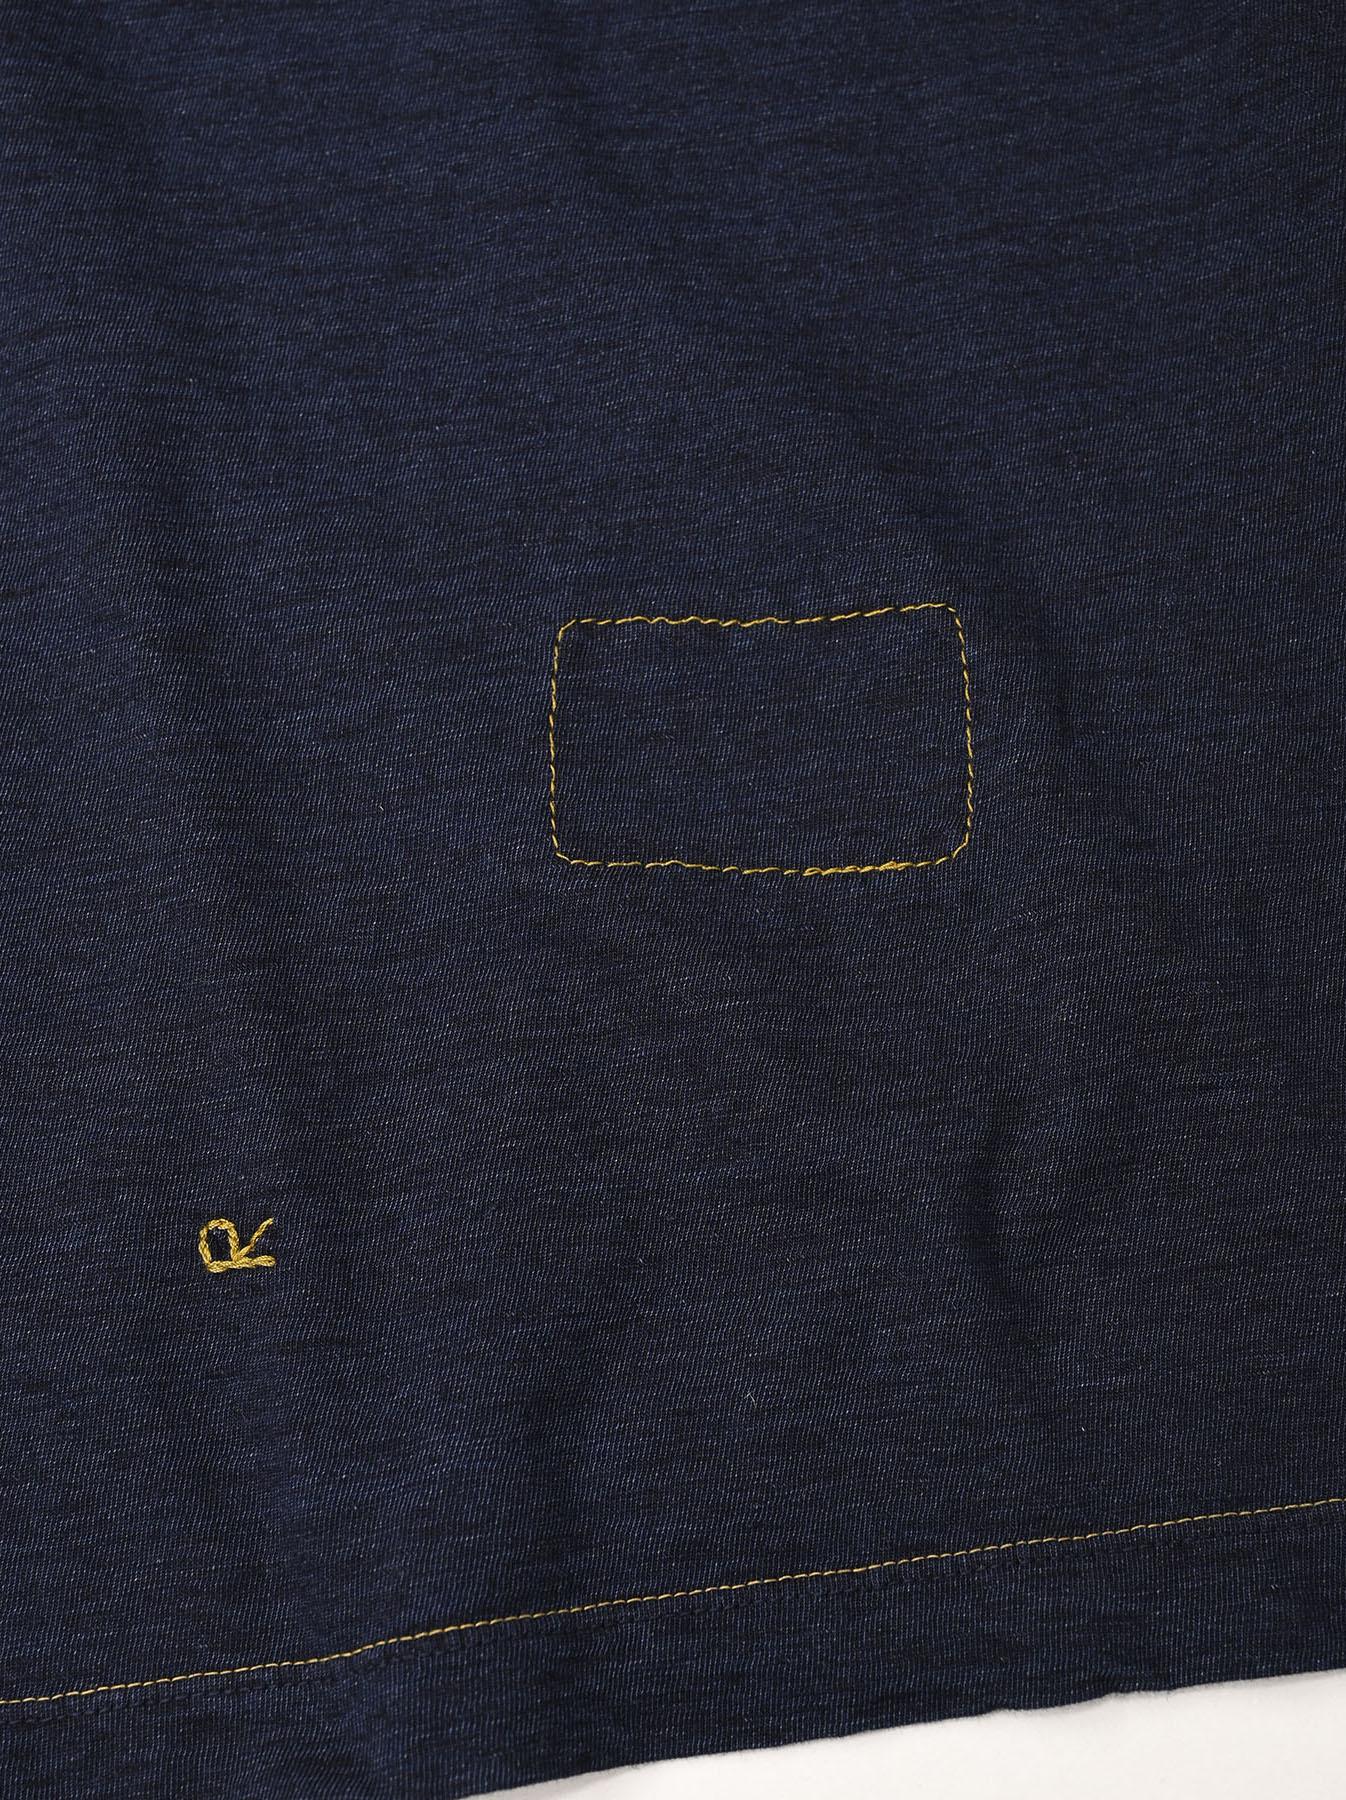 Indigo Zimbabwe 908 Ocean T-shirt-12